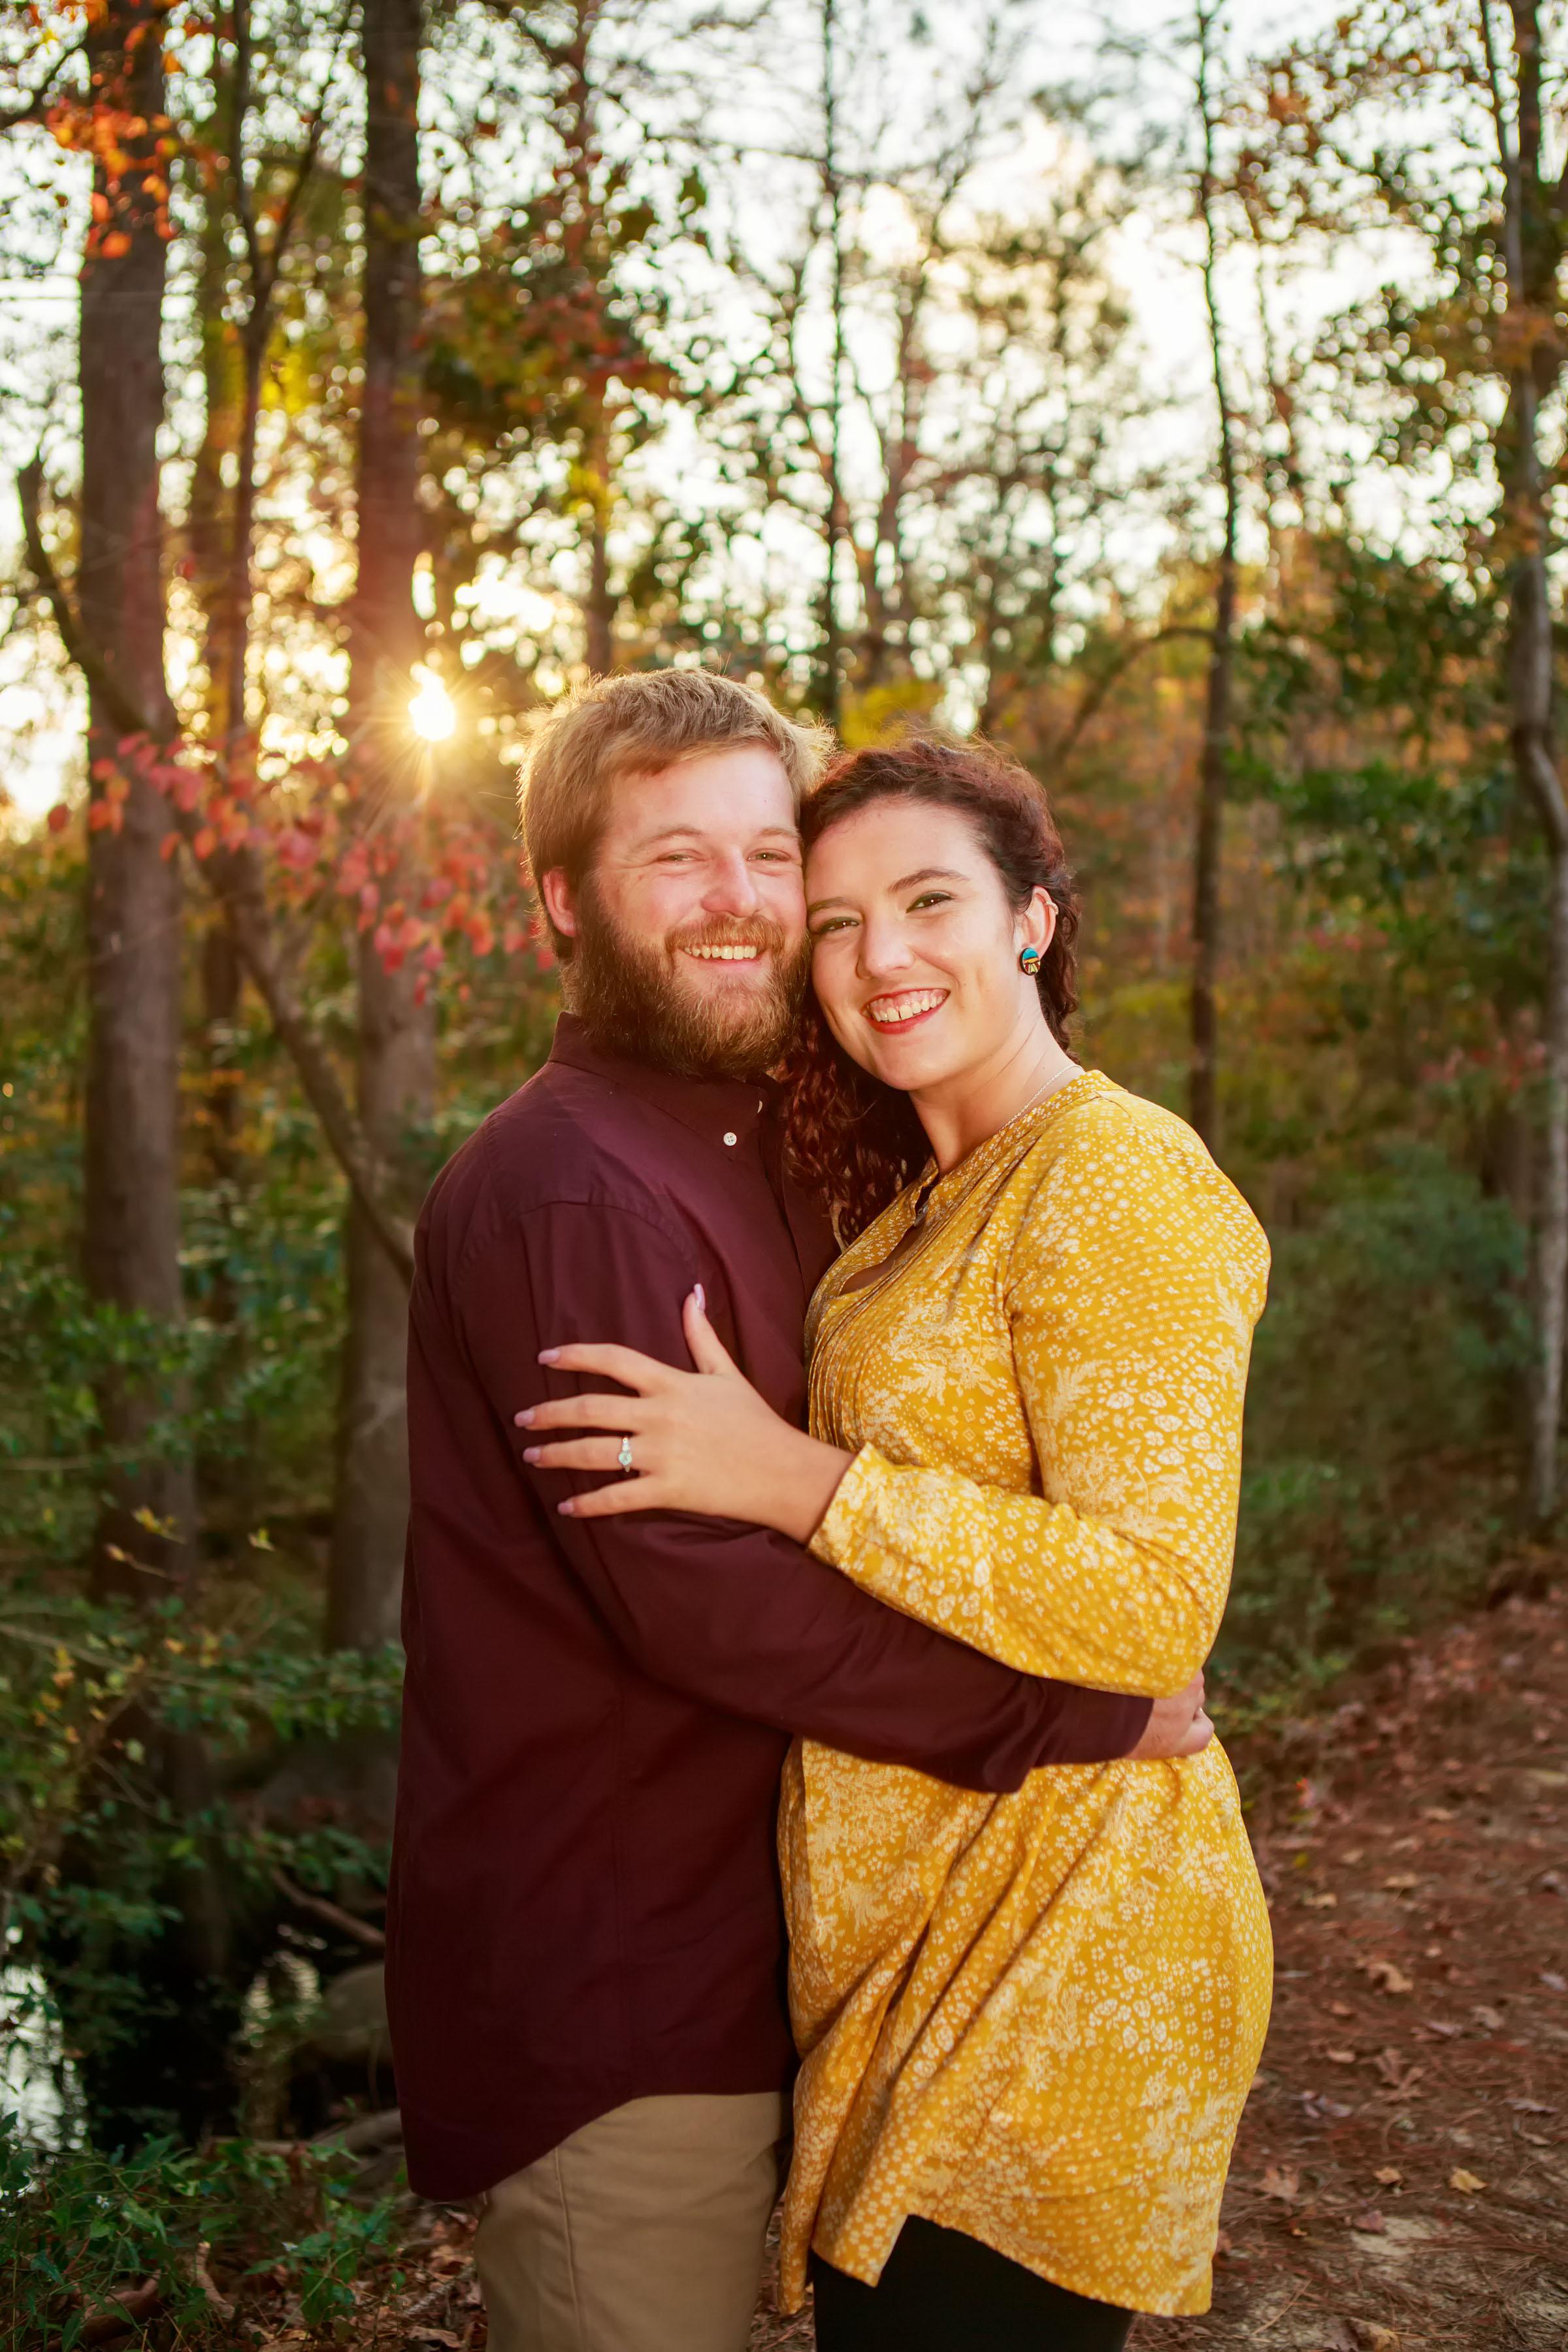 Wilmington_NC_Engagement_Photos_Tiffany_Abruzzo_Photography_15.jpg